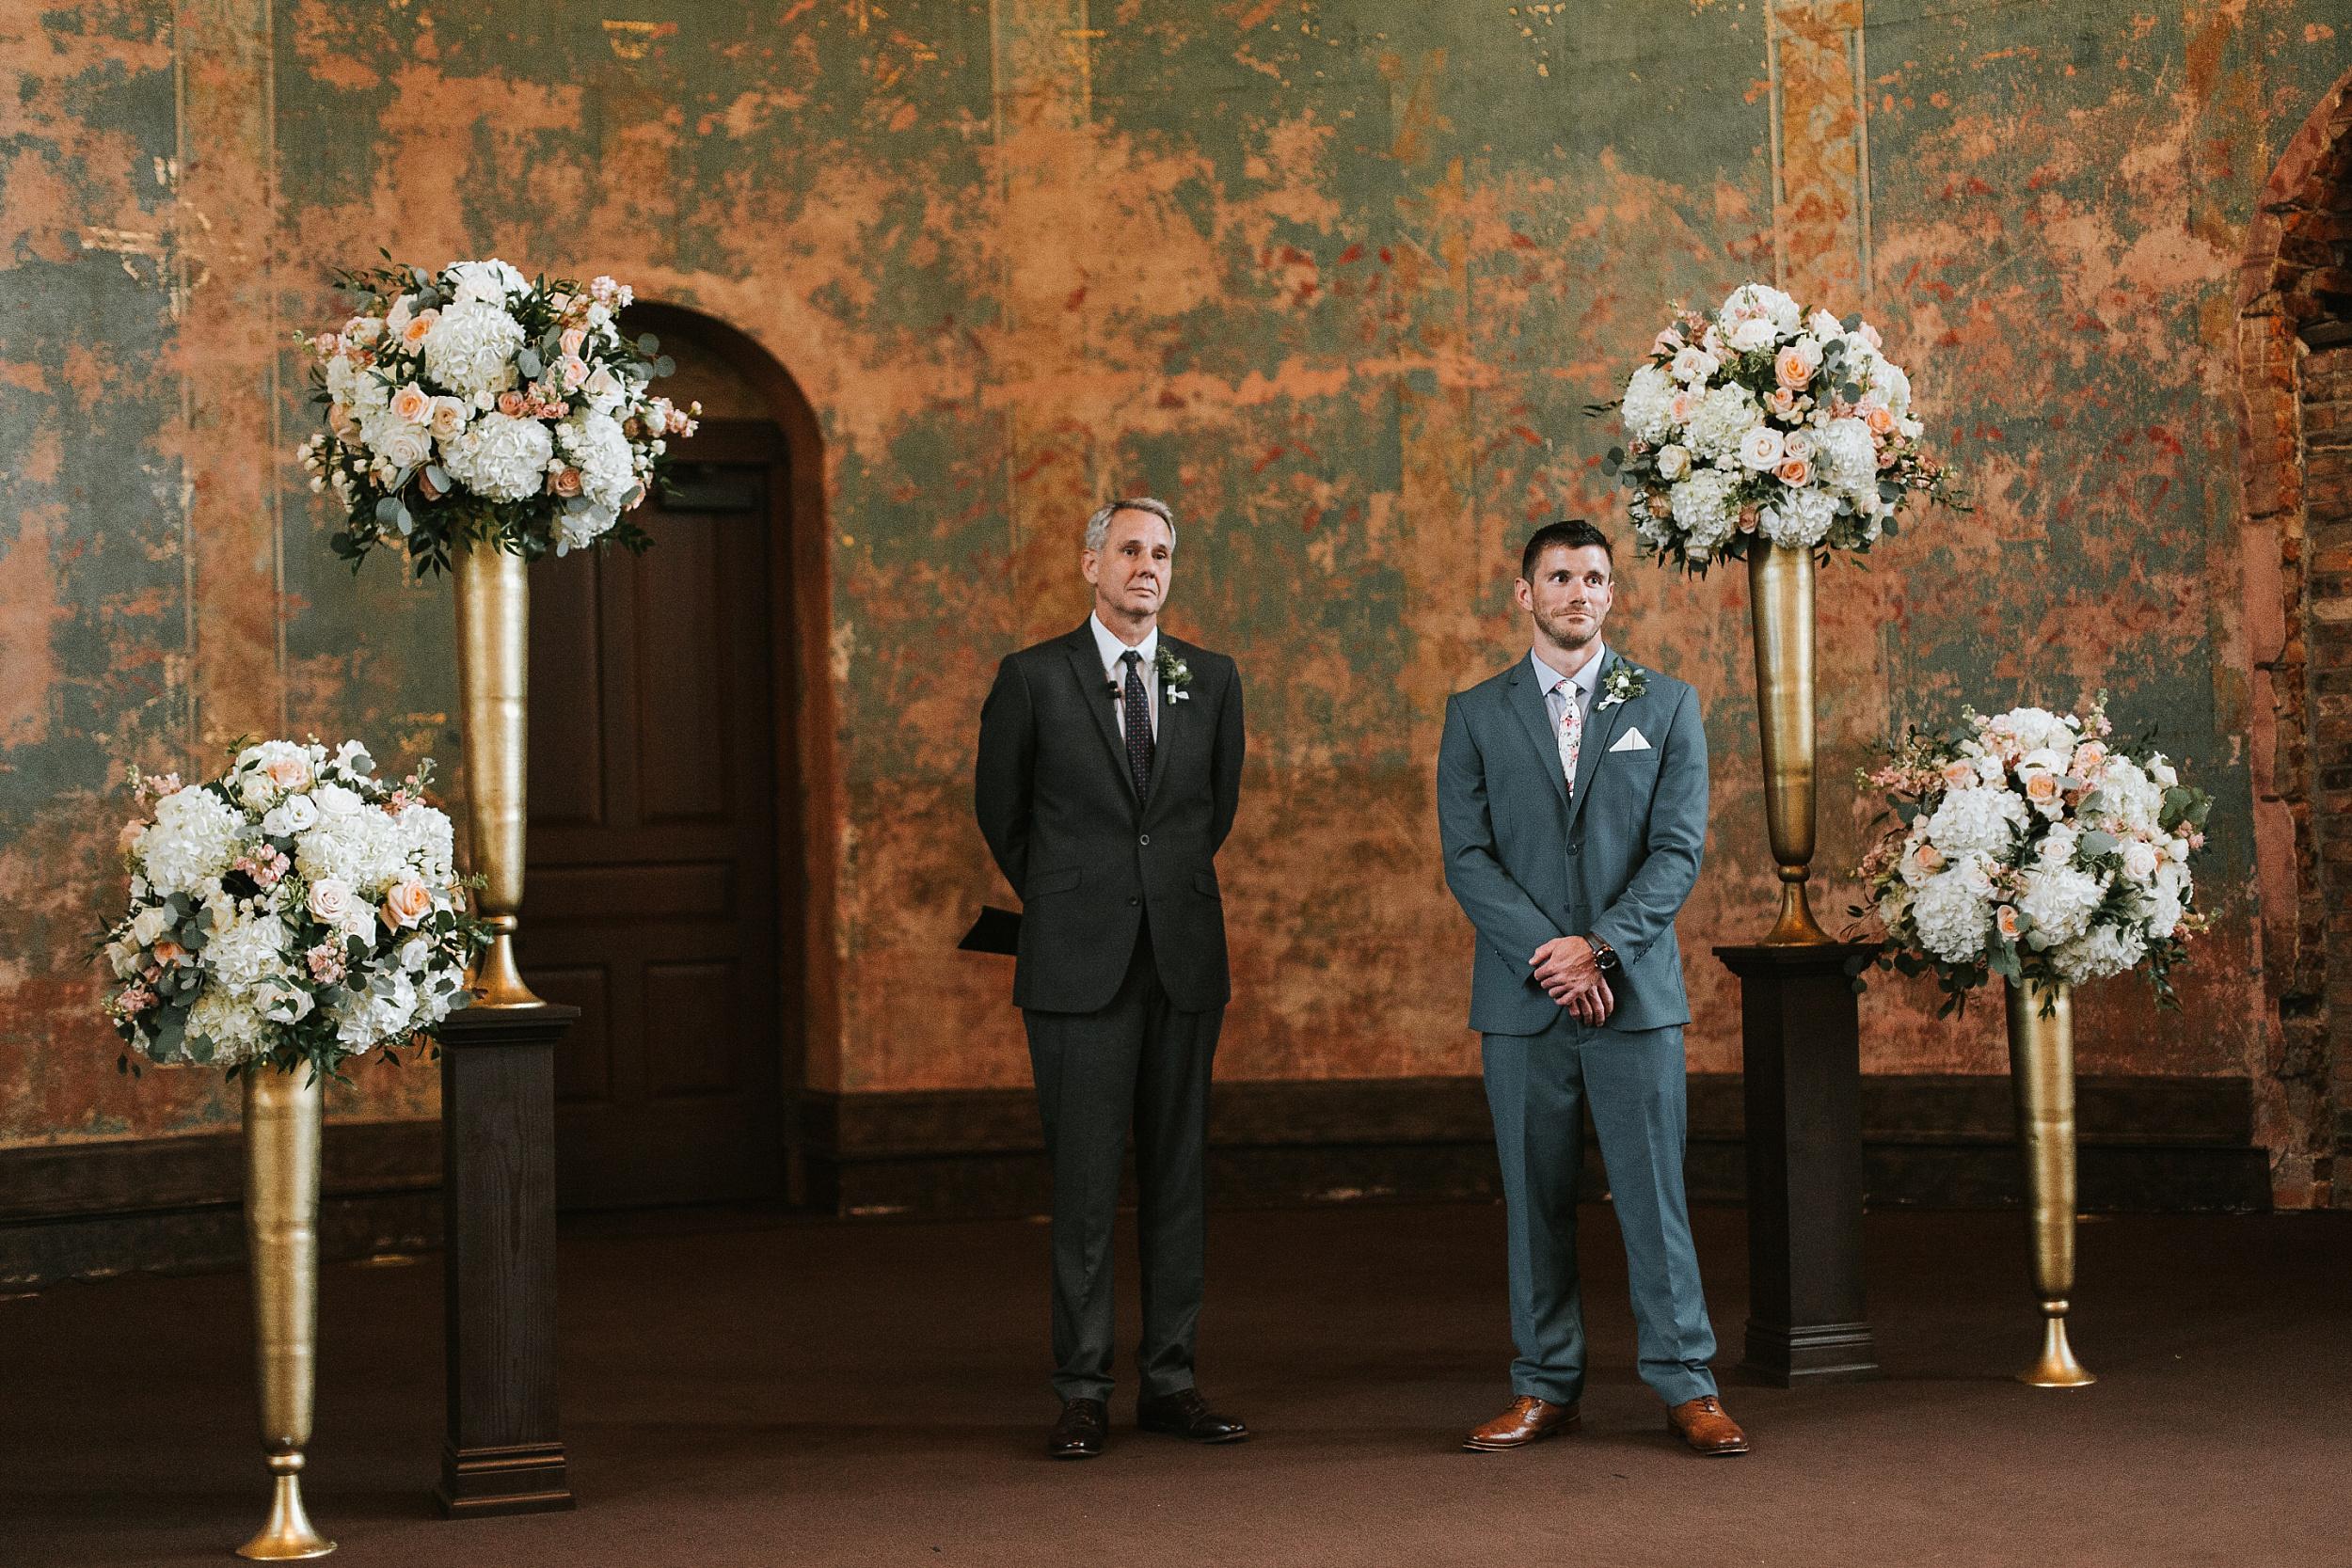 Brooke Townsend Photography - Cincinnati Wedding Photographer (101 of 170).jpg